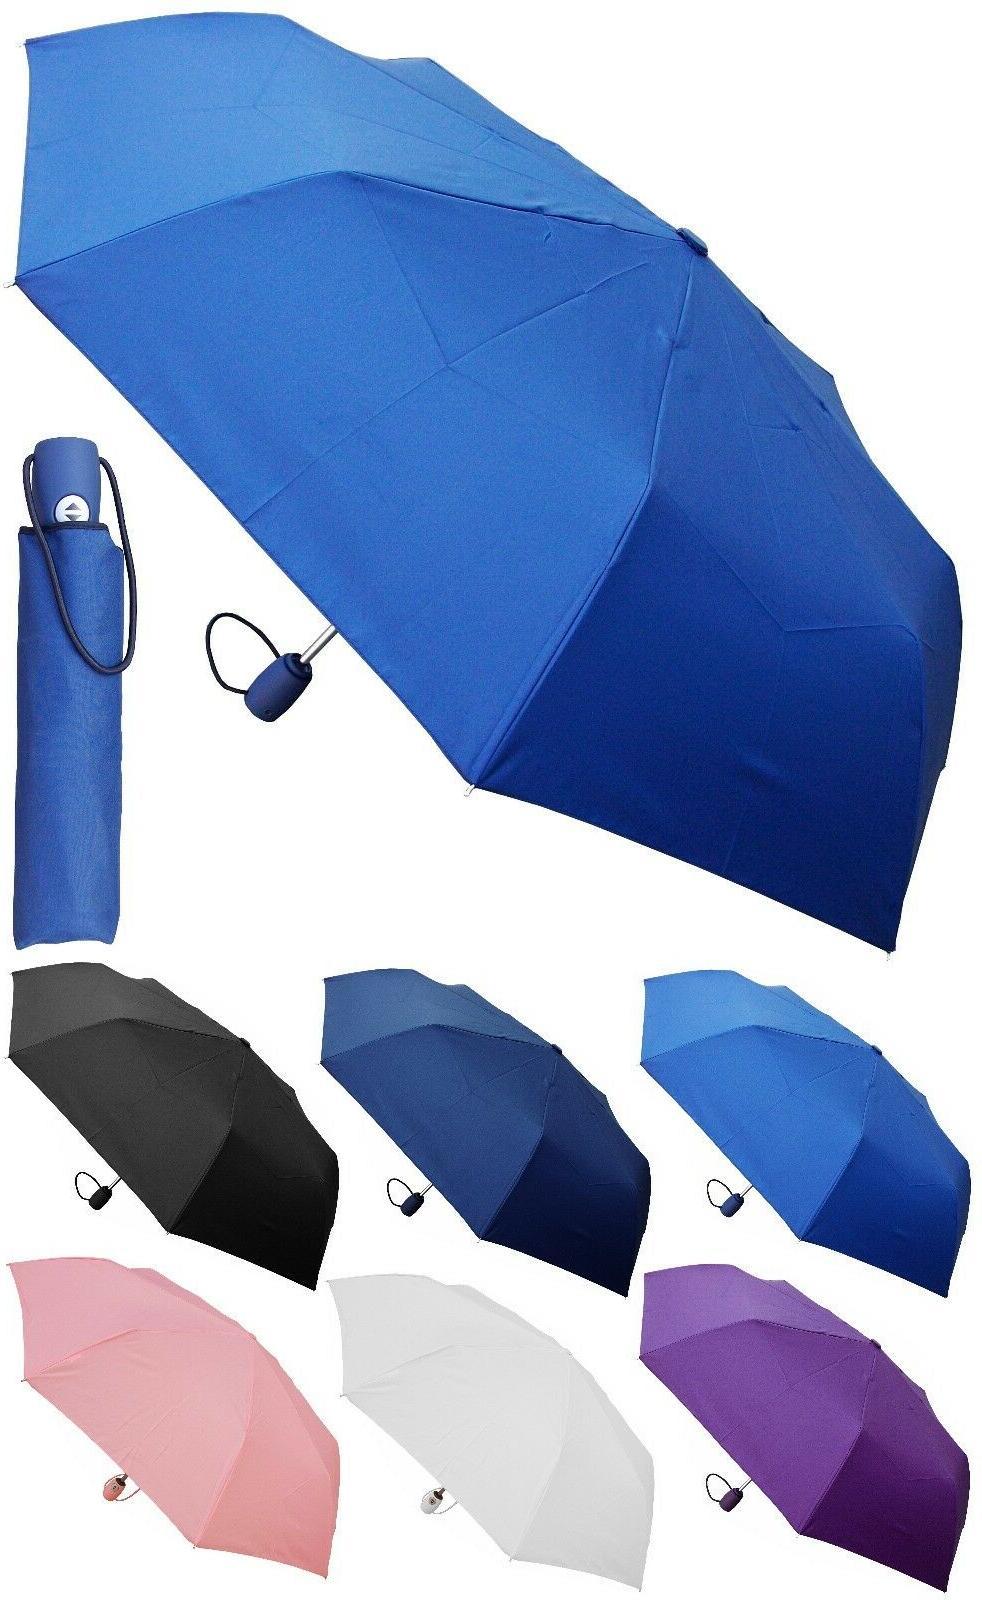 42 arc stylish mini auto auto rain